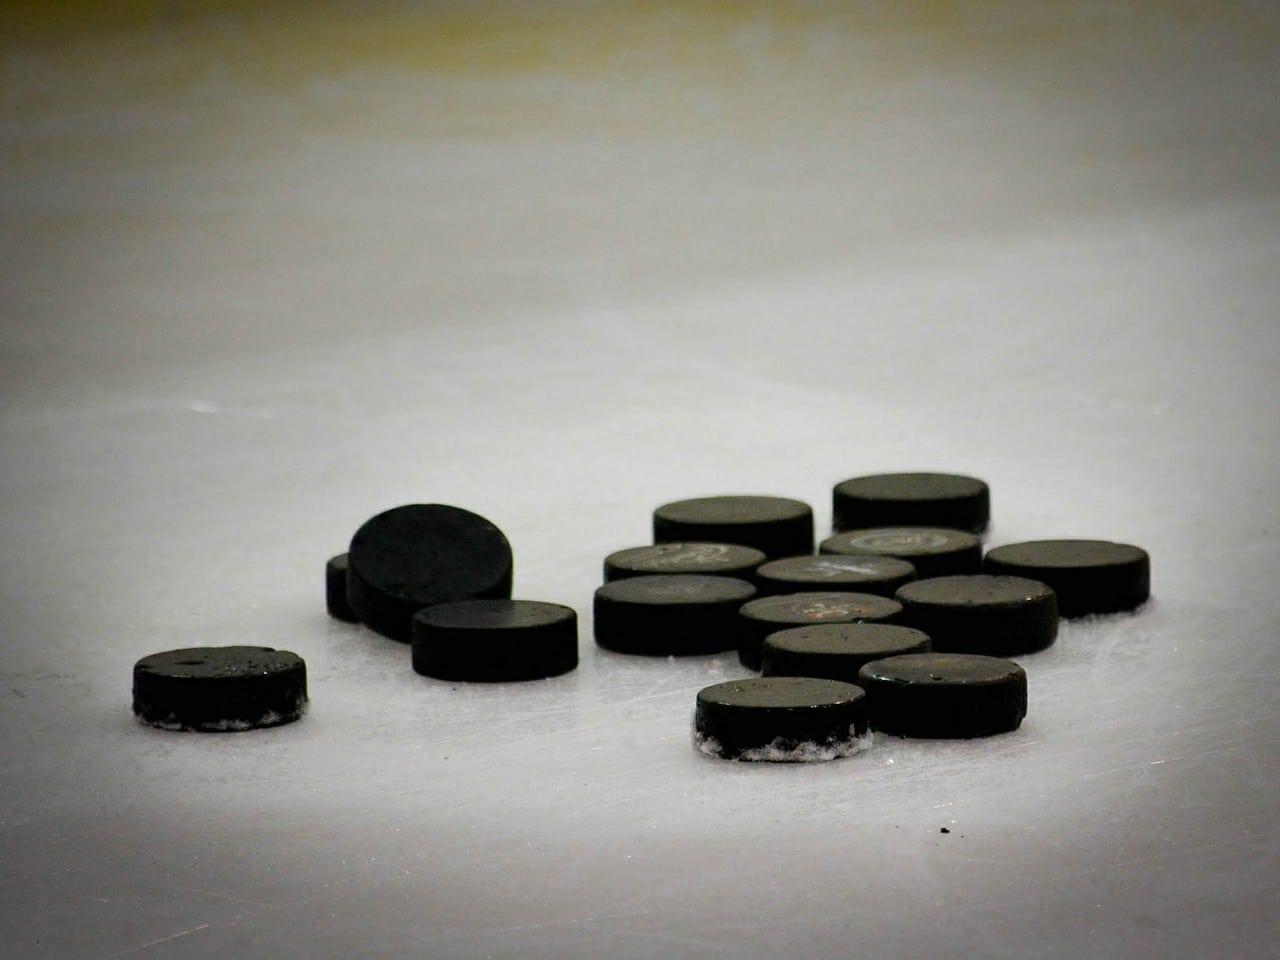 hockey-puck-608582_1280